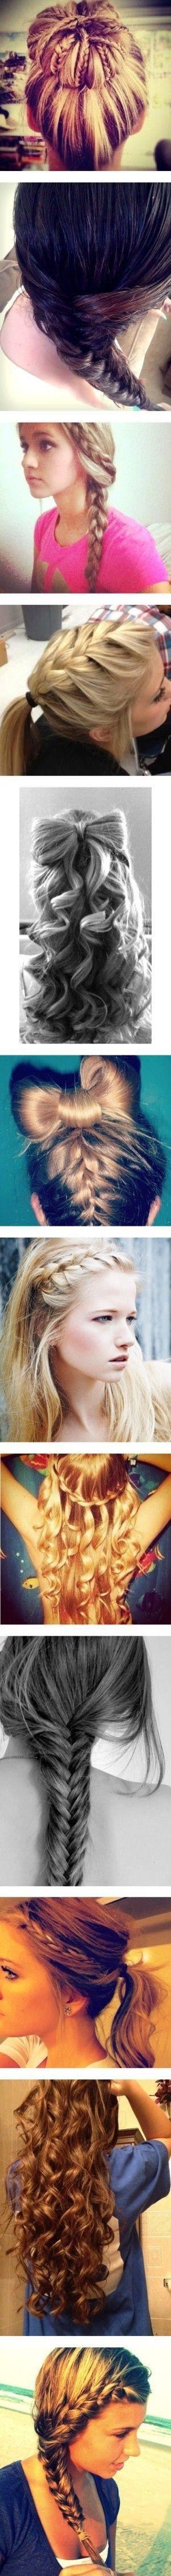 Cute hairstyles belinda peregrin shÜll pinterest hair style